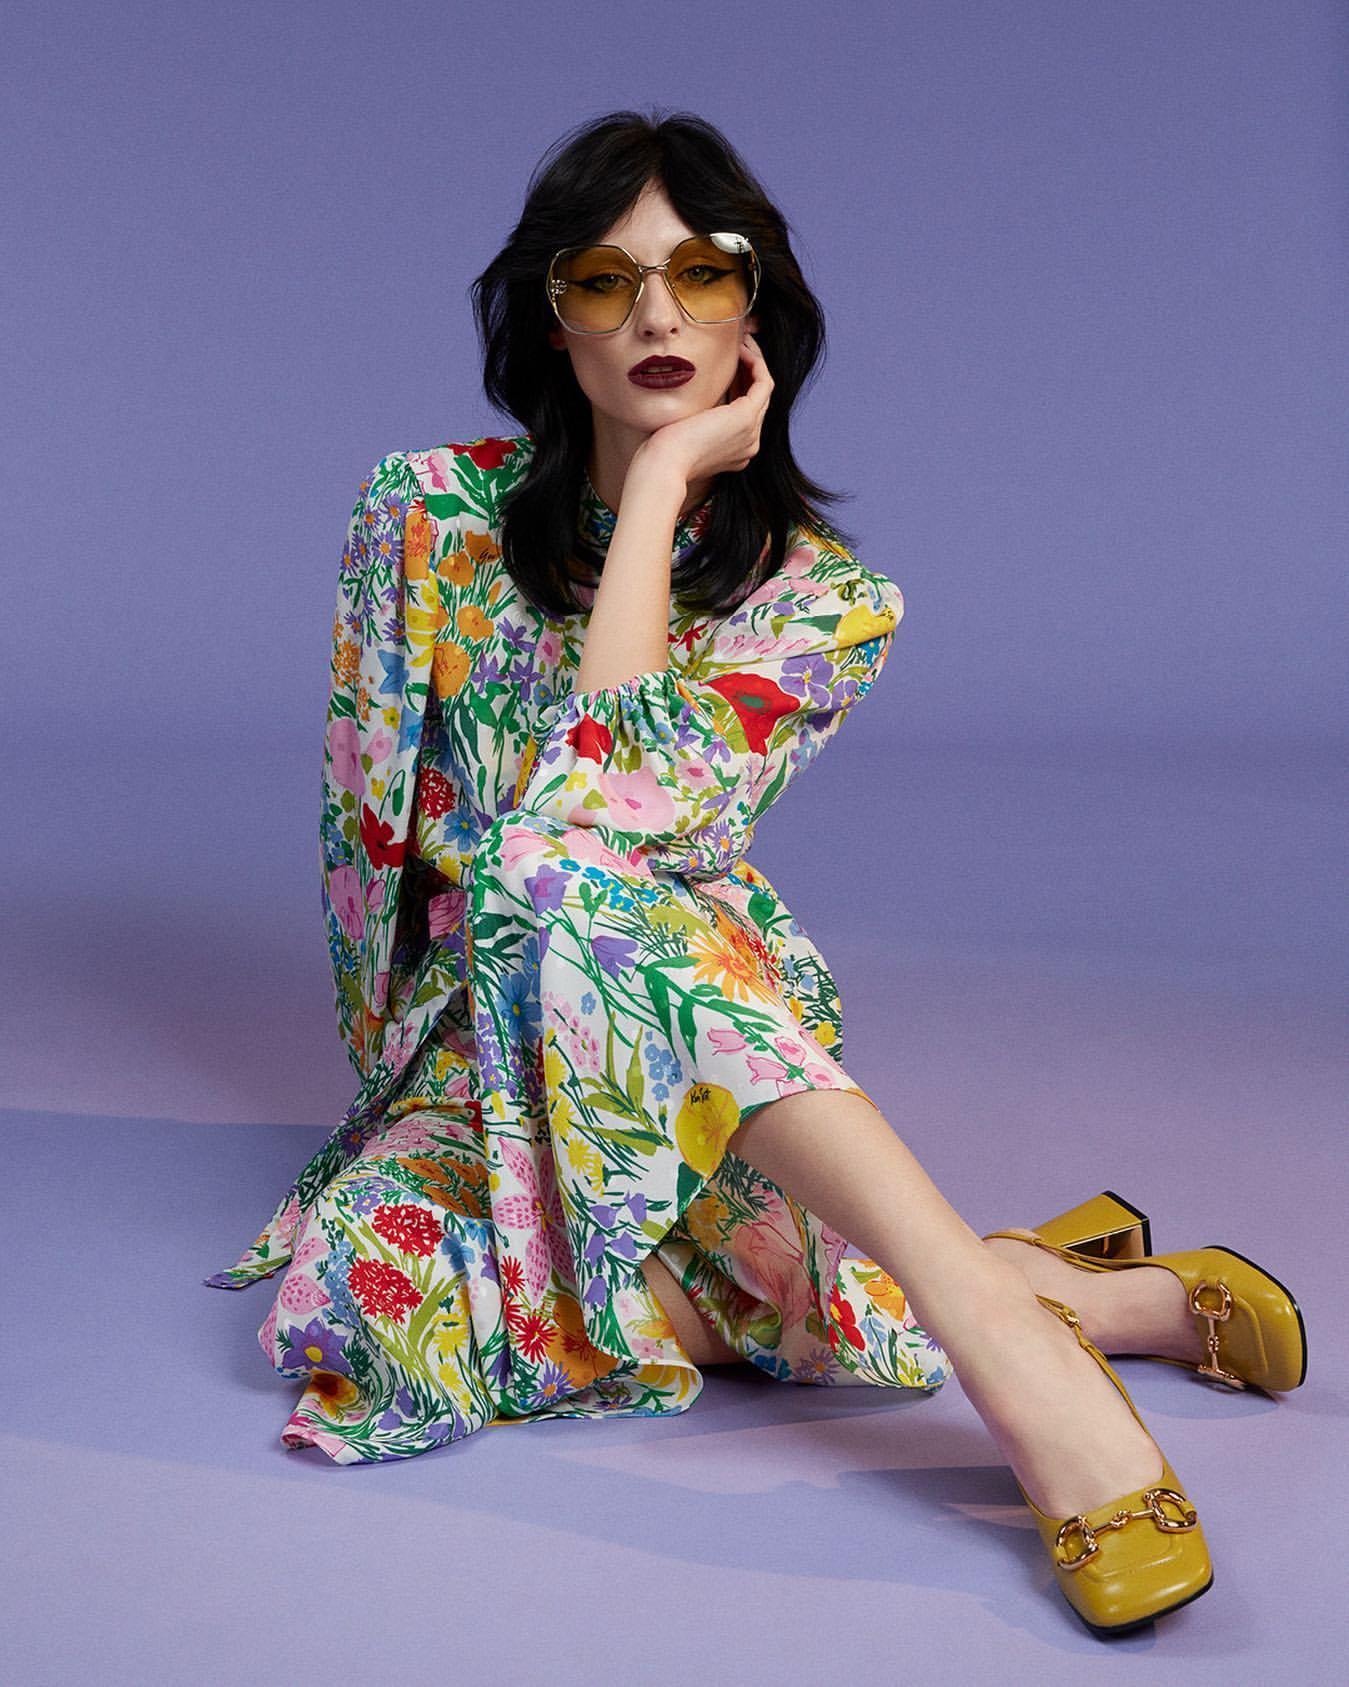 sunglasses dress